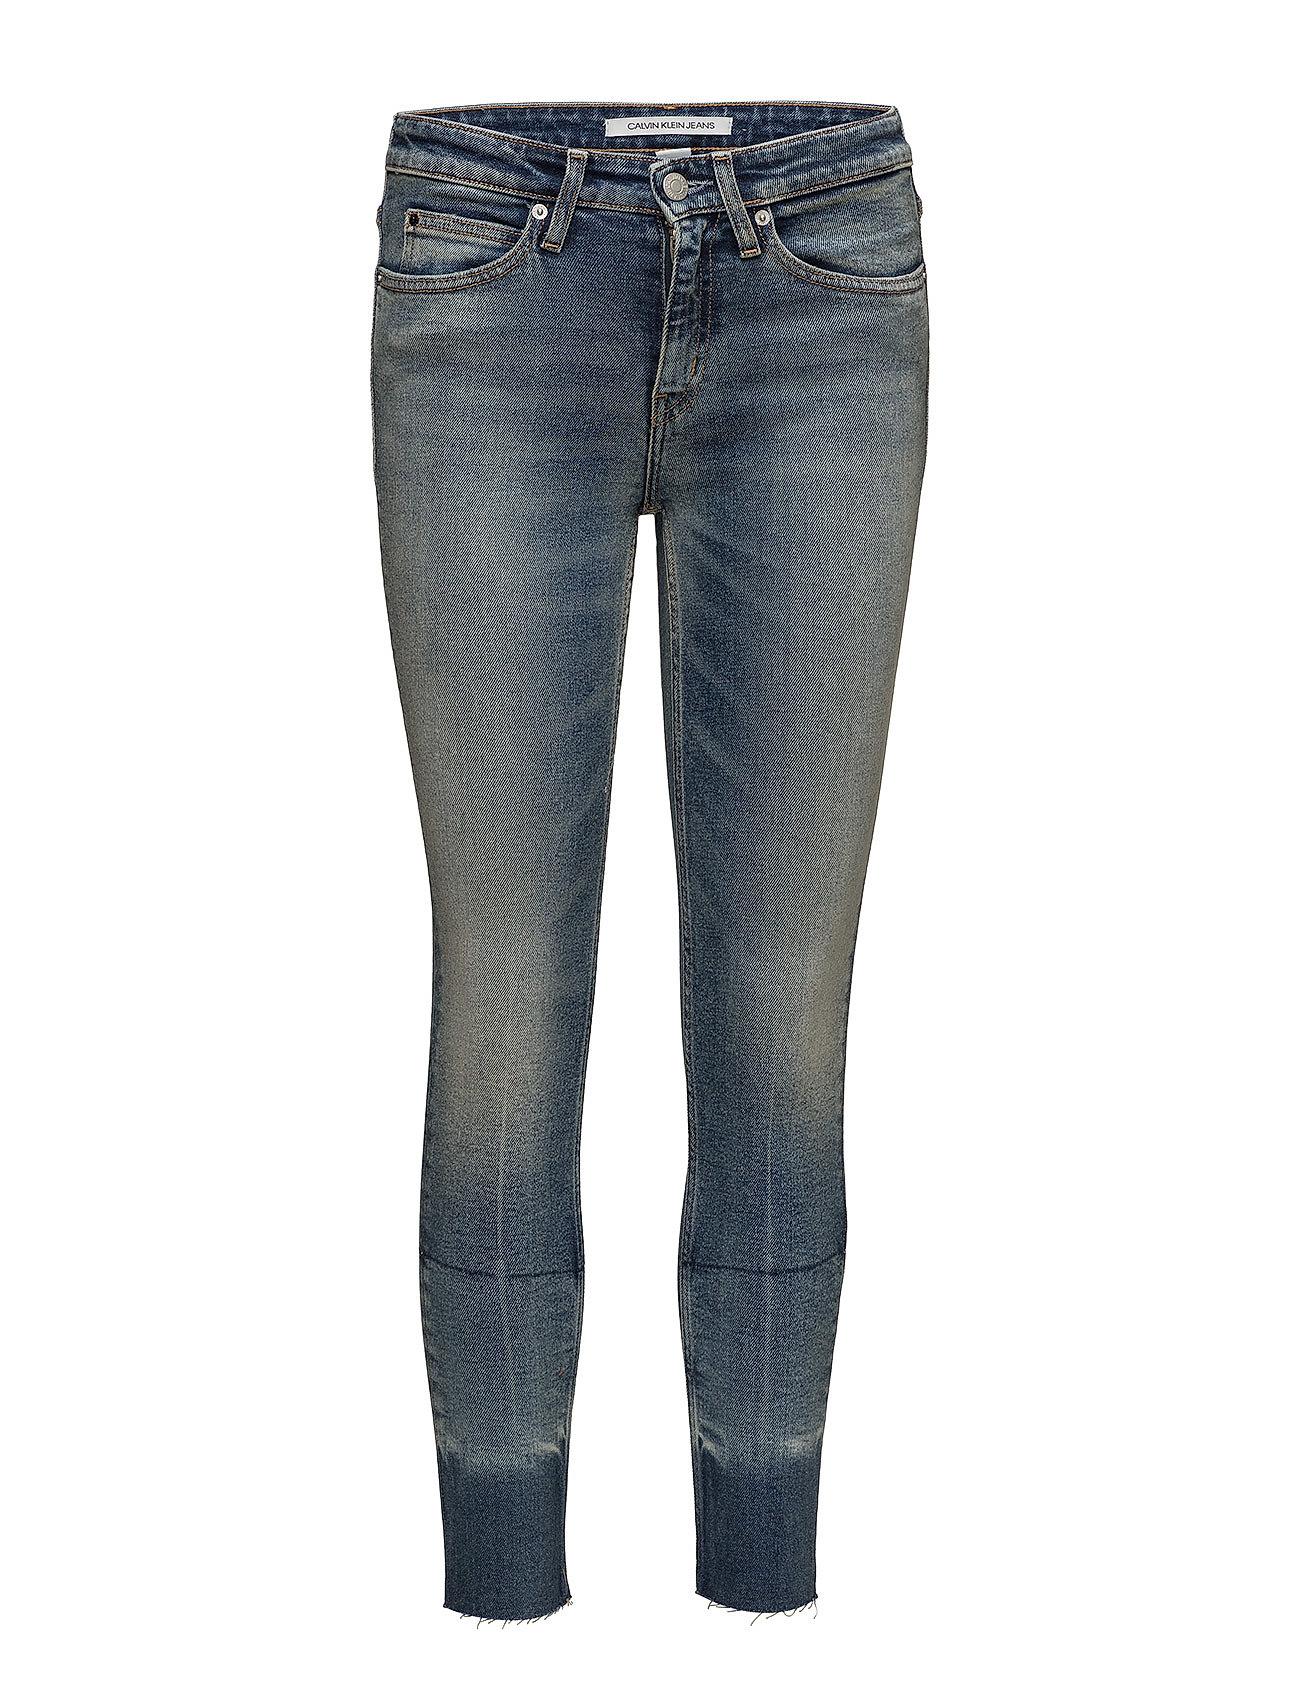 Image of Ckj 011: Mid Rise Skinny West Ankle Skinny Jeans Blå Calvin Klein Jeans (3491486855)